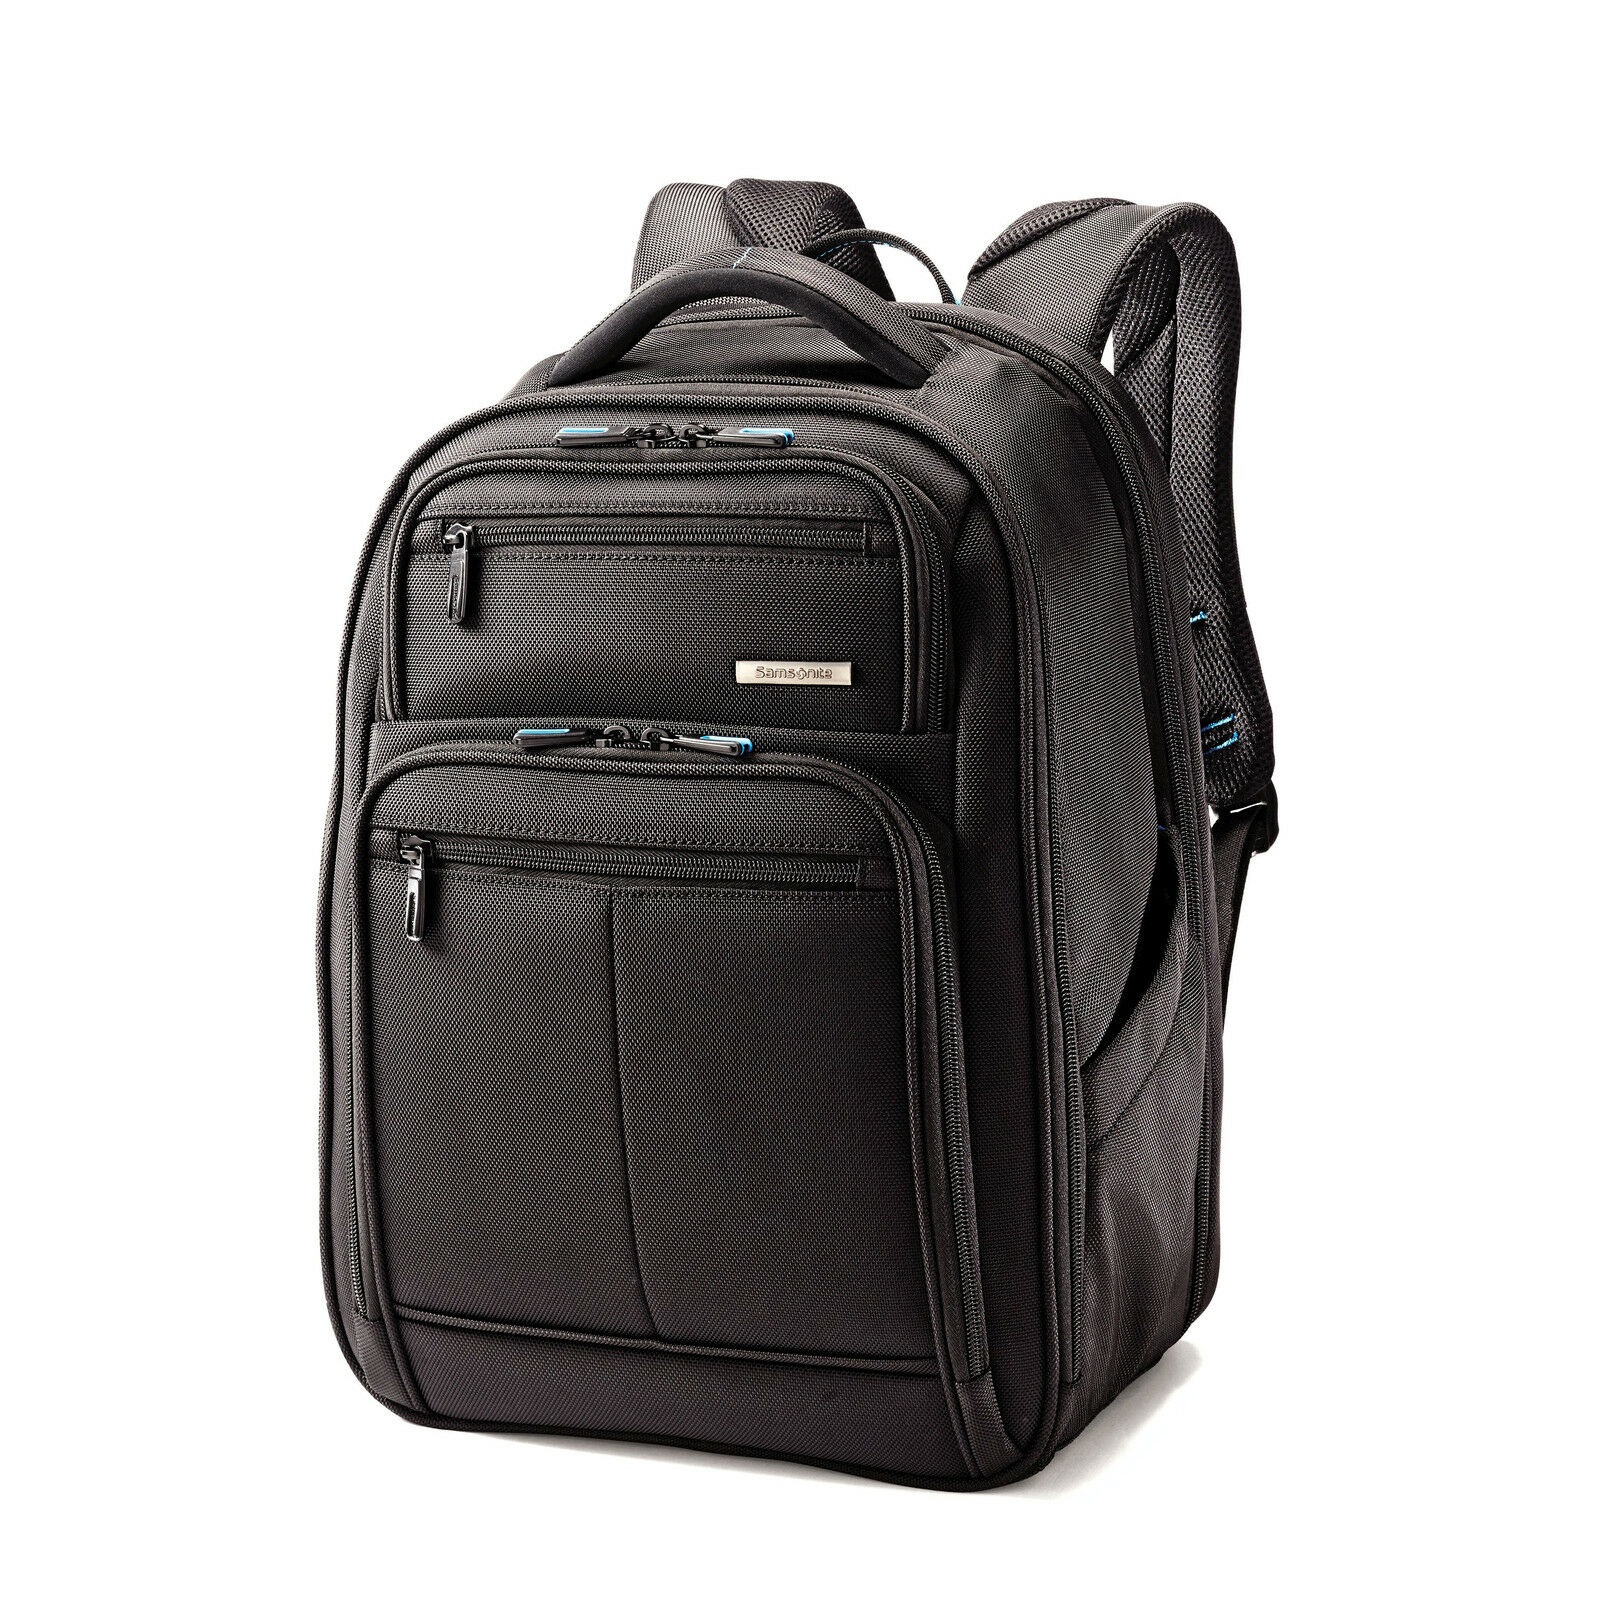 满$25额外8.5折!Samsonite 新秀丽 Novex Perfect 双肩包背包电脑包